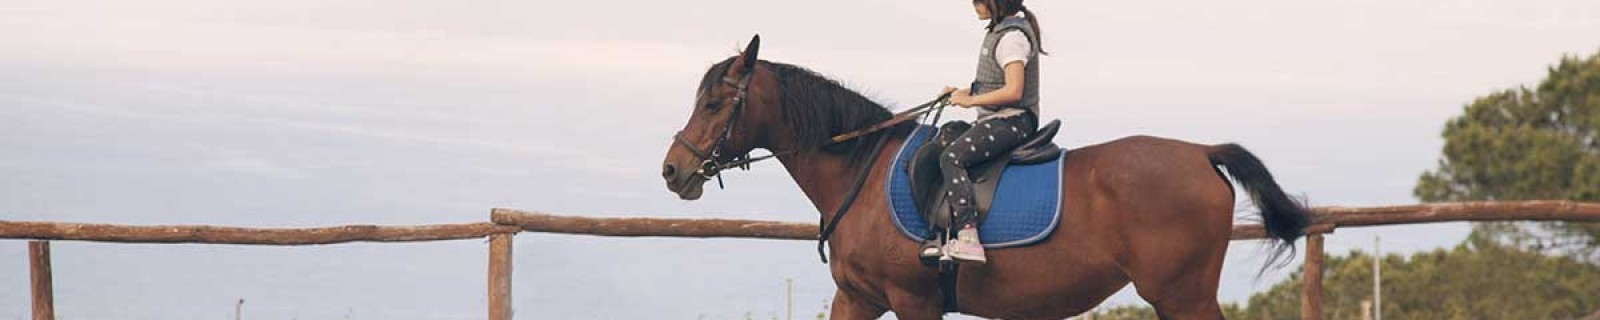 a-cavallo